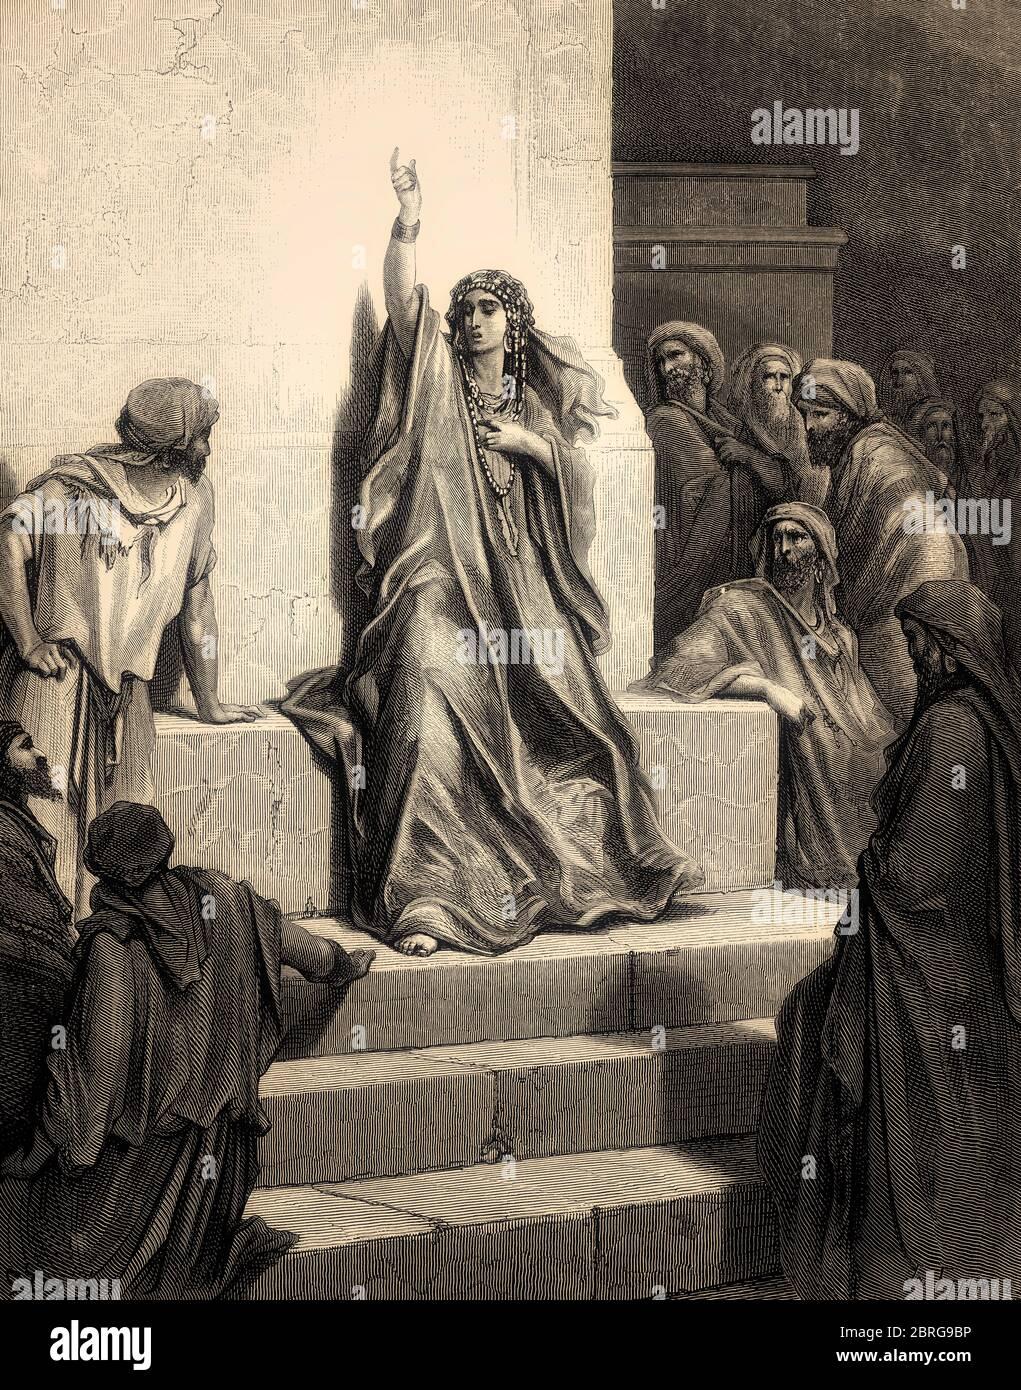 Deborah Praises Jael, Old Testament, Gustave Doré, 1863 Stock Photo